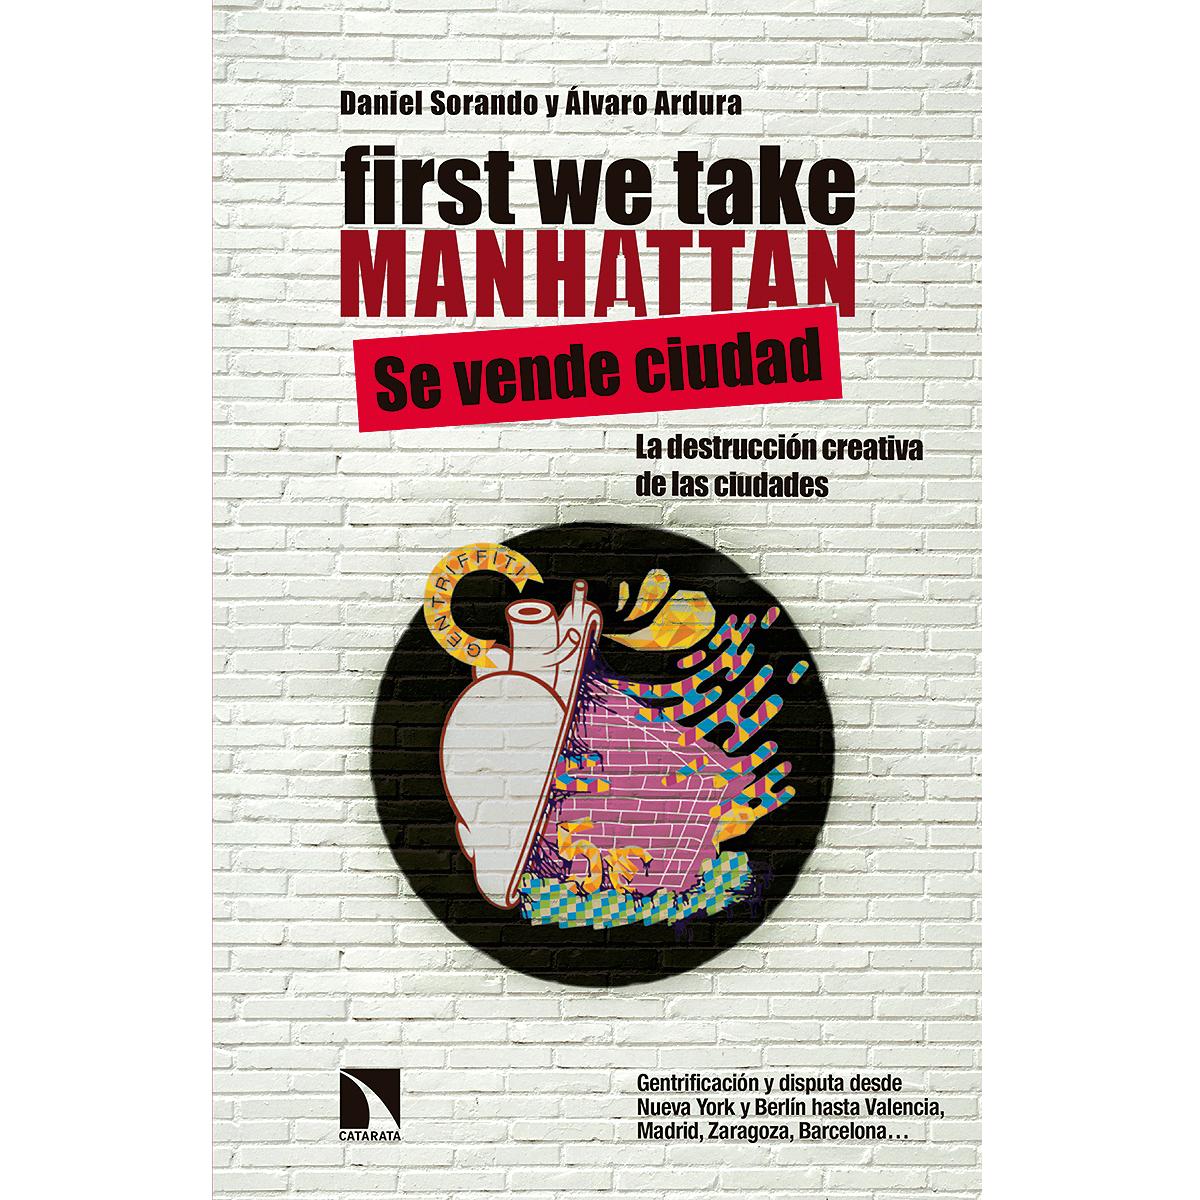 First we take Manhattan. Se vende la ciudad